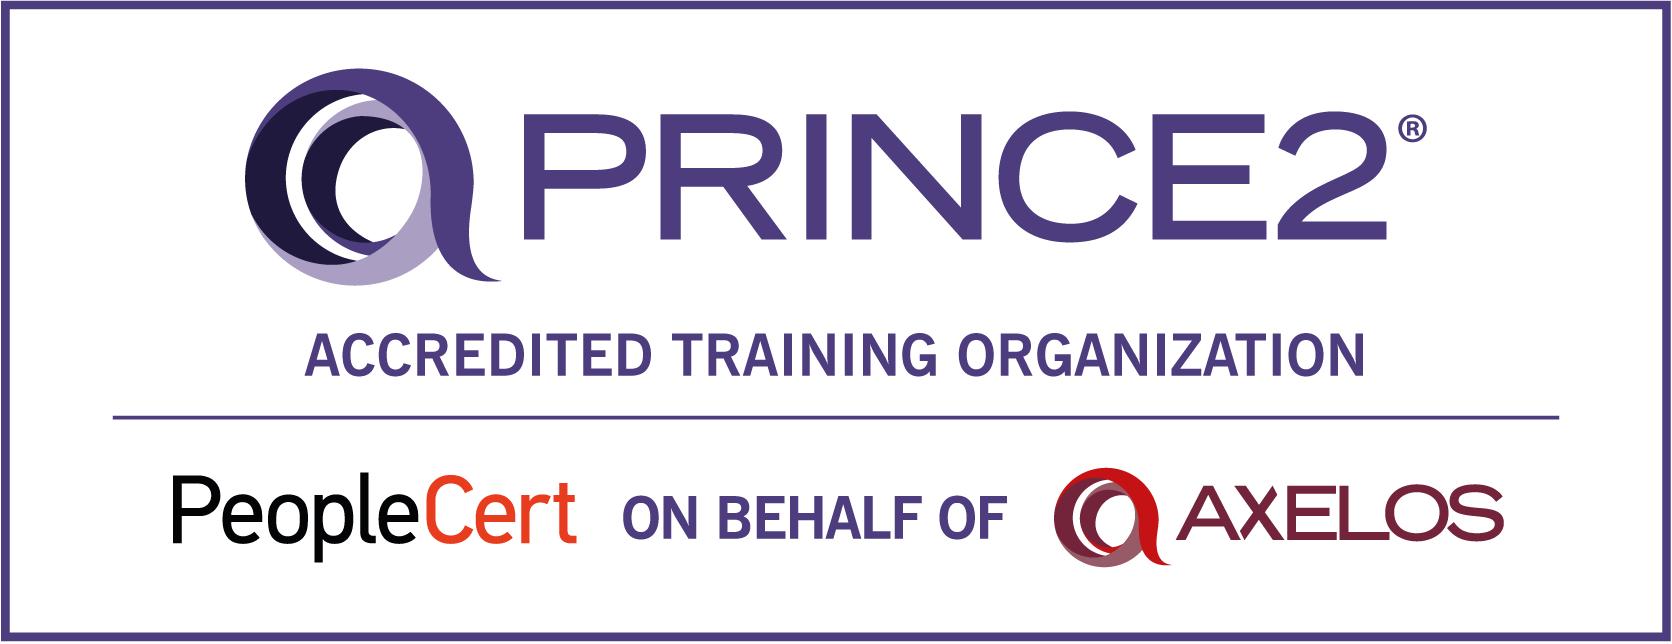 PRINCE2 foundation training